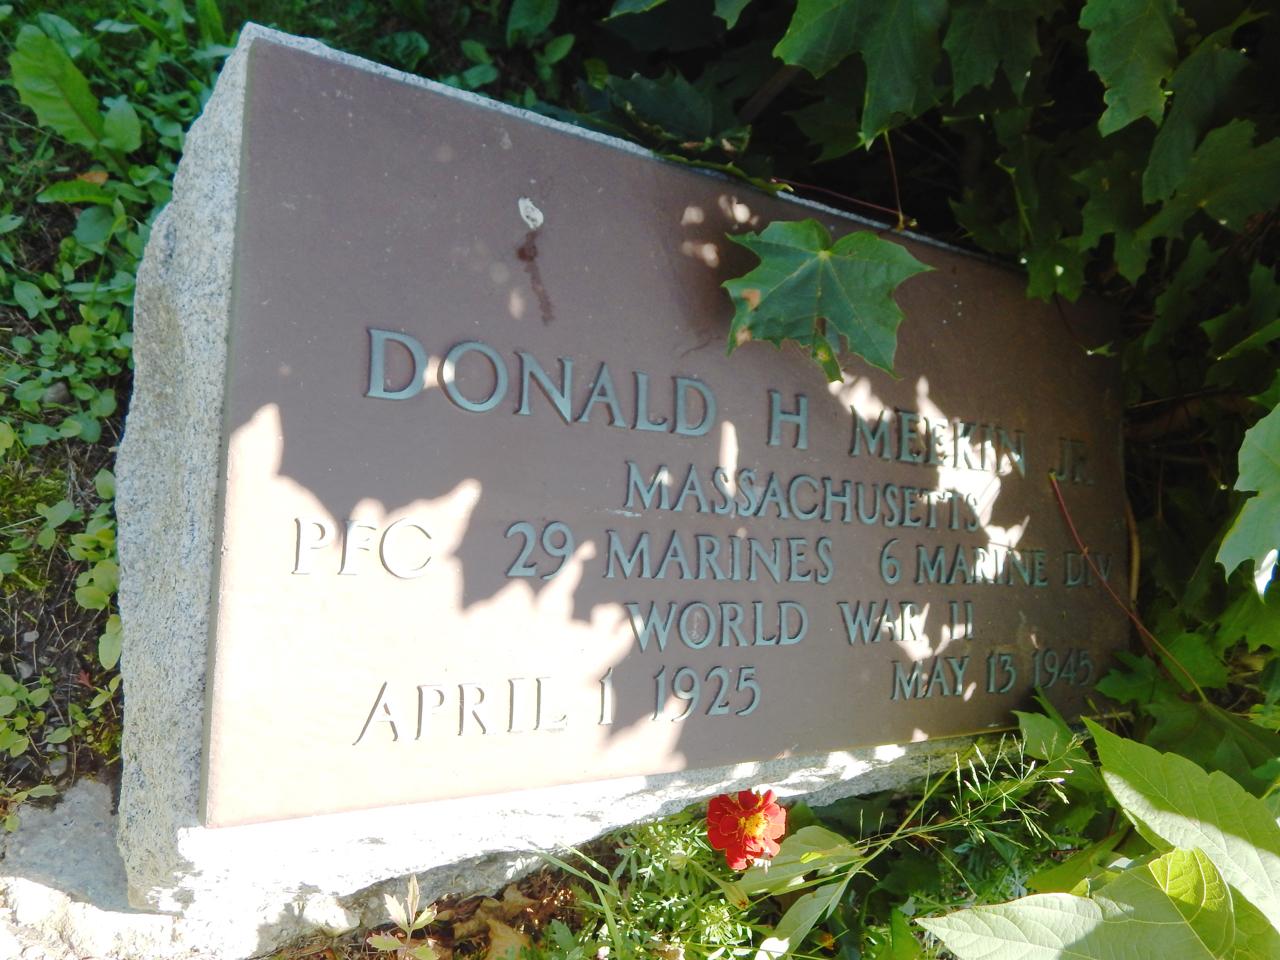 Donald Hamilton Meekin, Jr